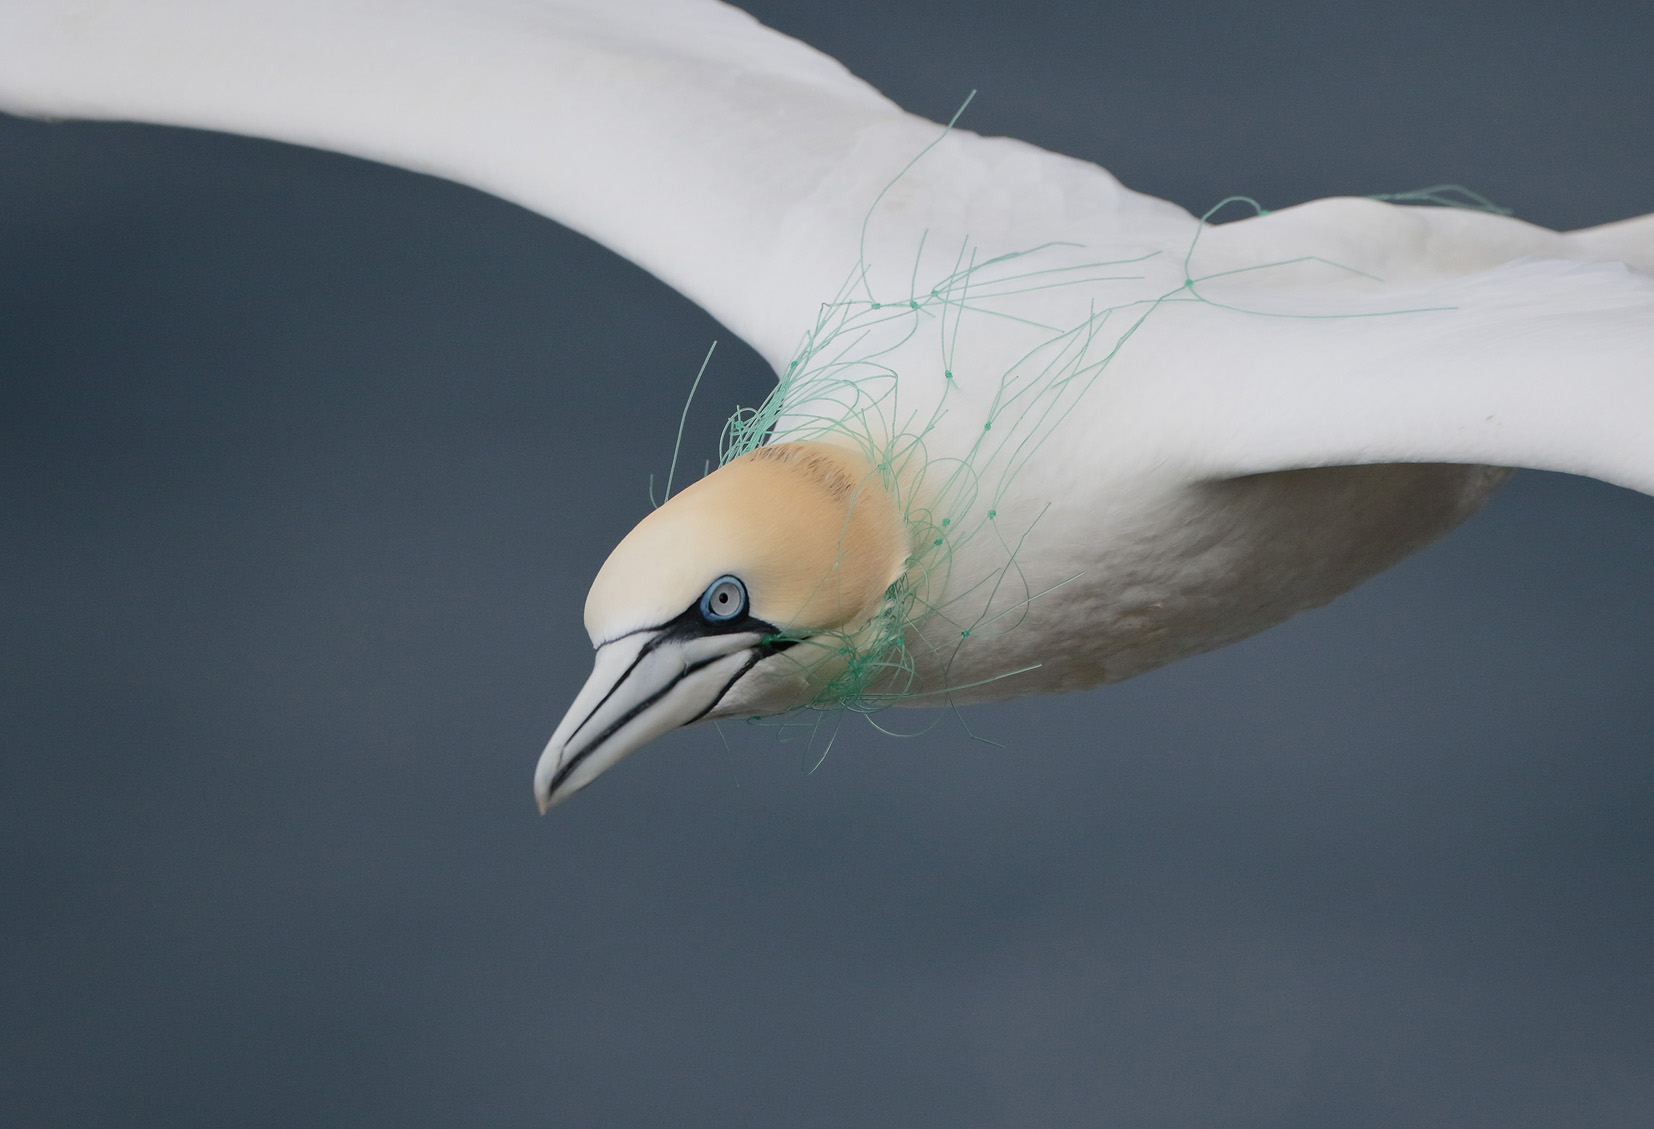 Gannet in Fishing Net © Robbie Brookes, Shetland - winner of Scottish Nature Photography Awards Environmental category 2017